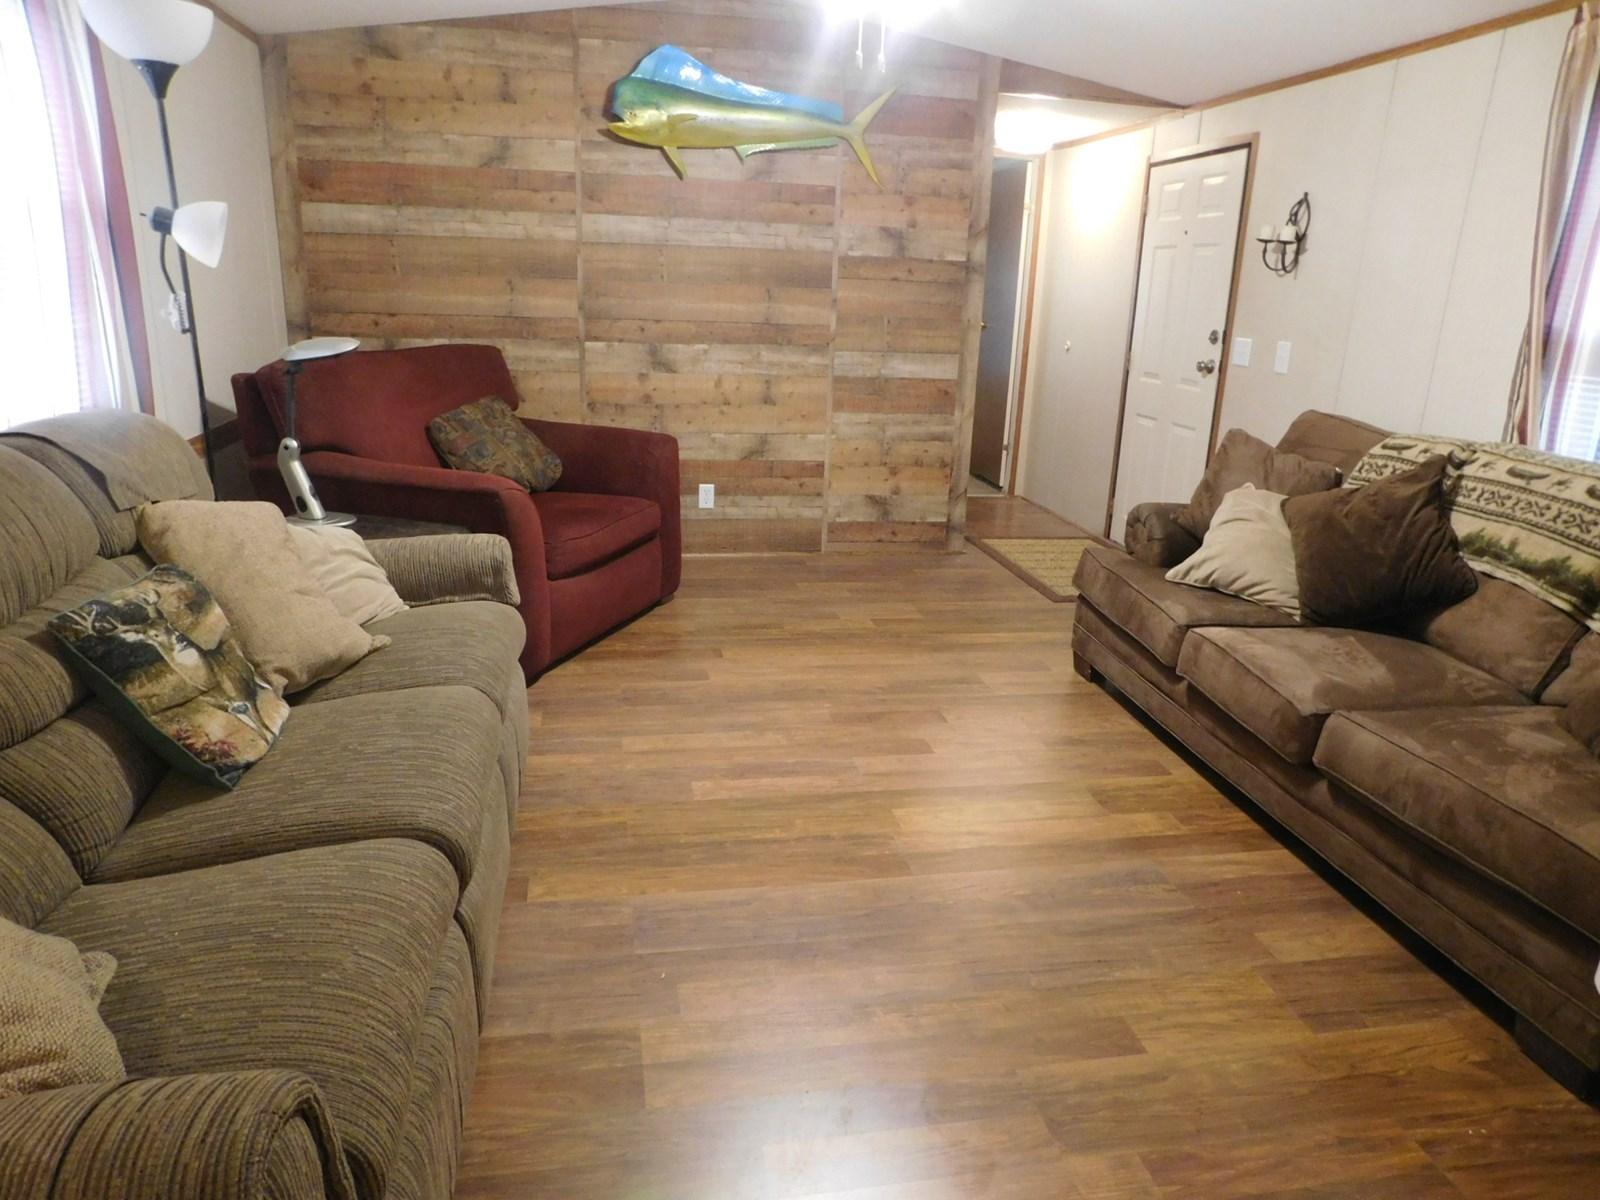 Lake House For Sale - Streetman, TX - Freestone County TX